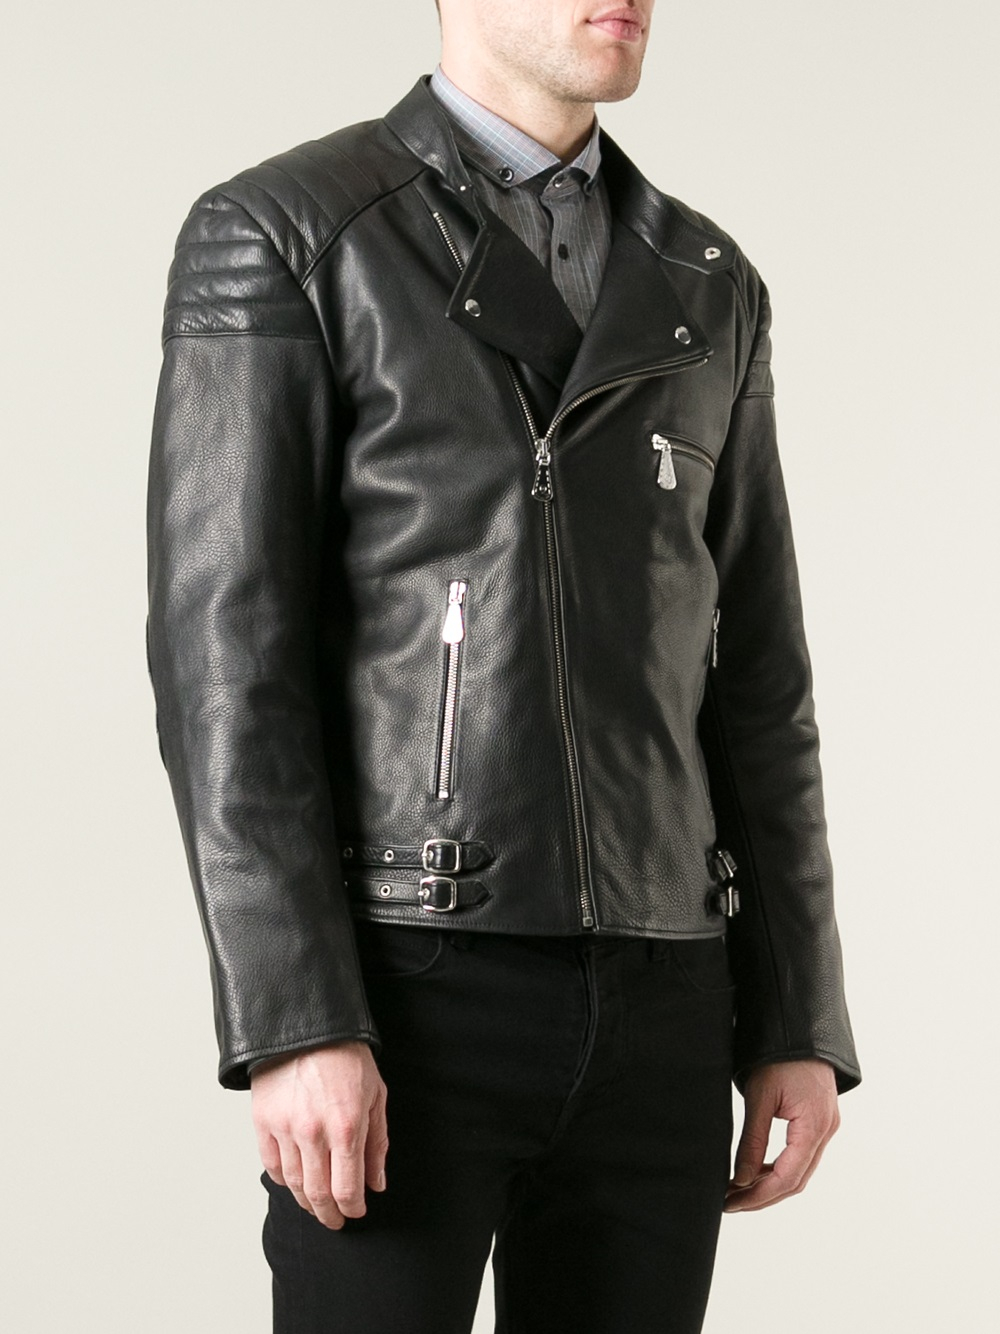 38a59f7171928 McQ Leather Biker Jacket in Black for Men - Lyst